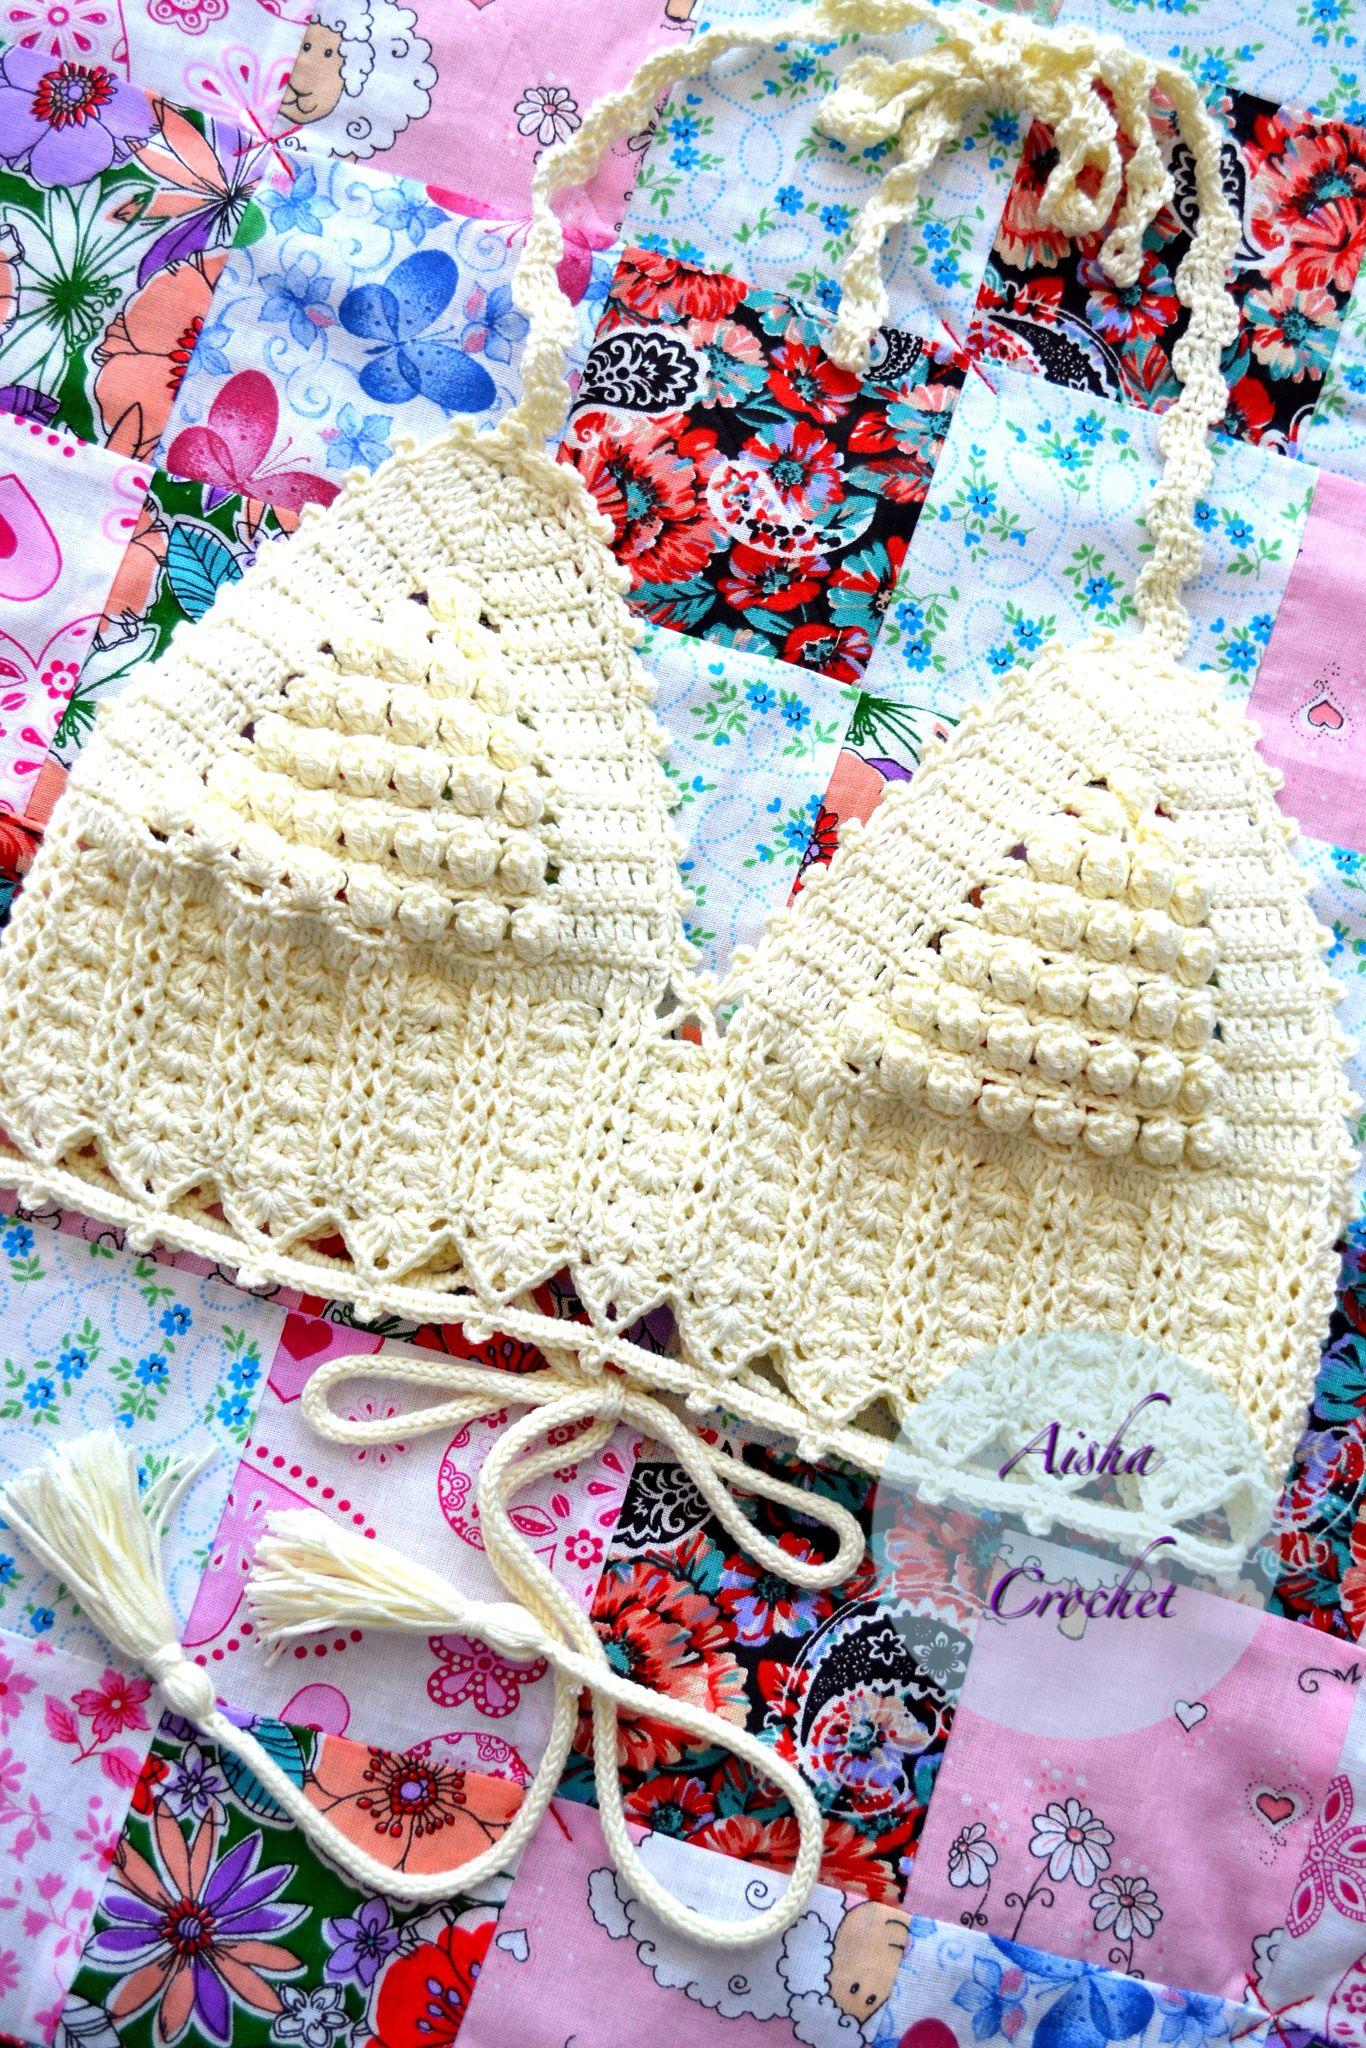 Crochet crop top, Aisha crochet uncinetto